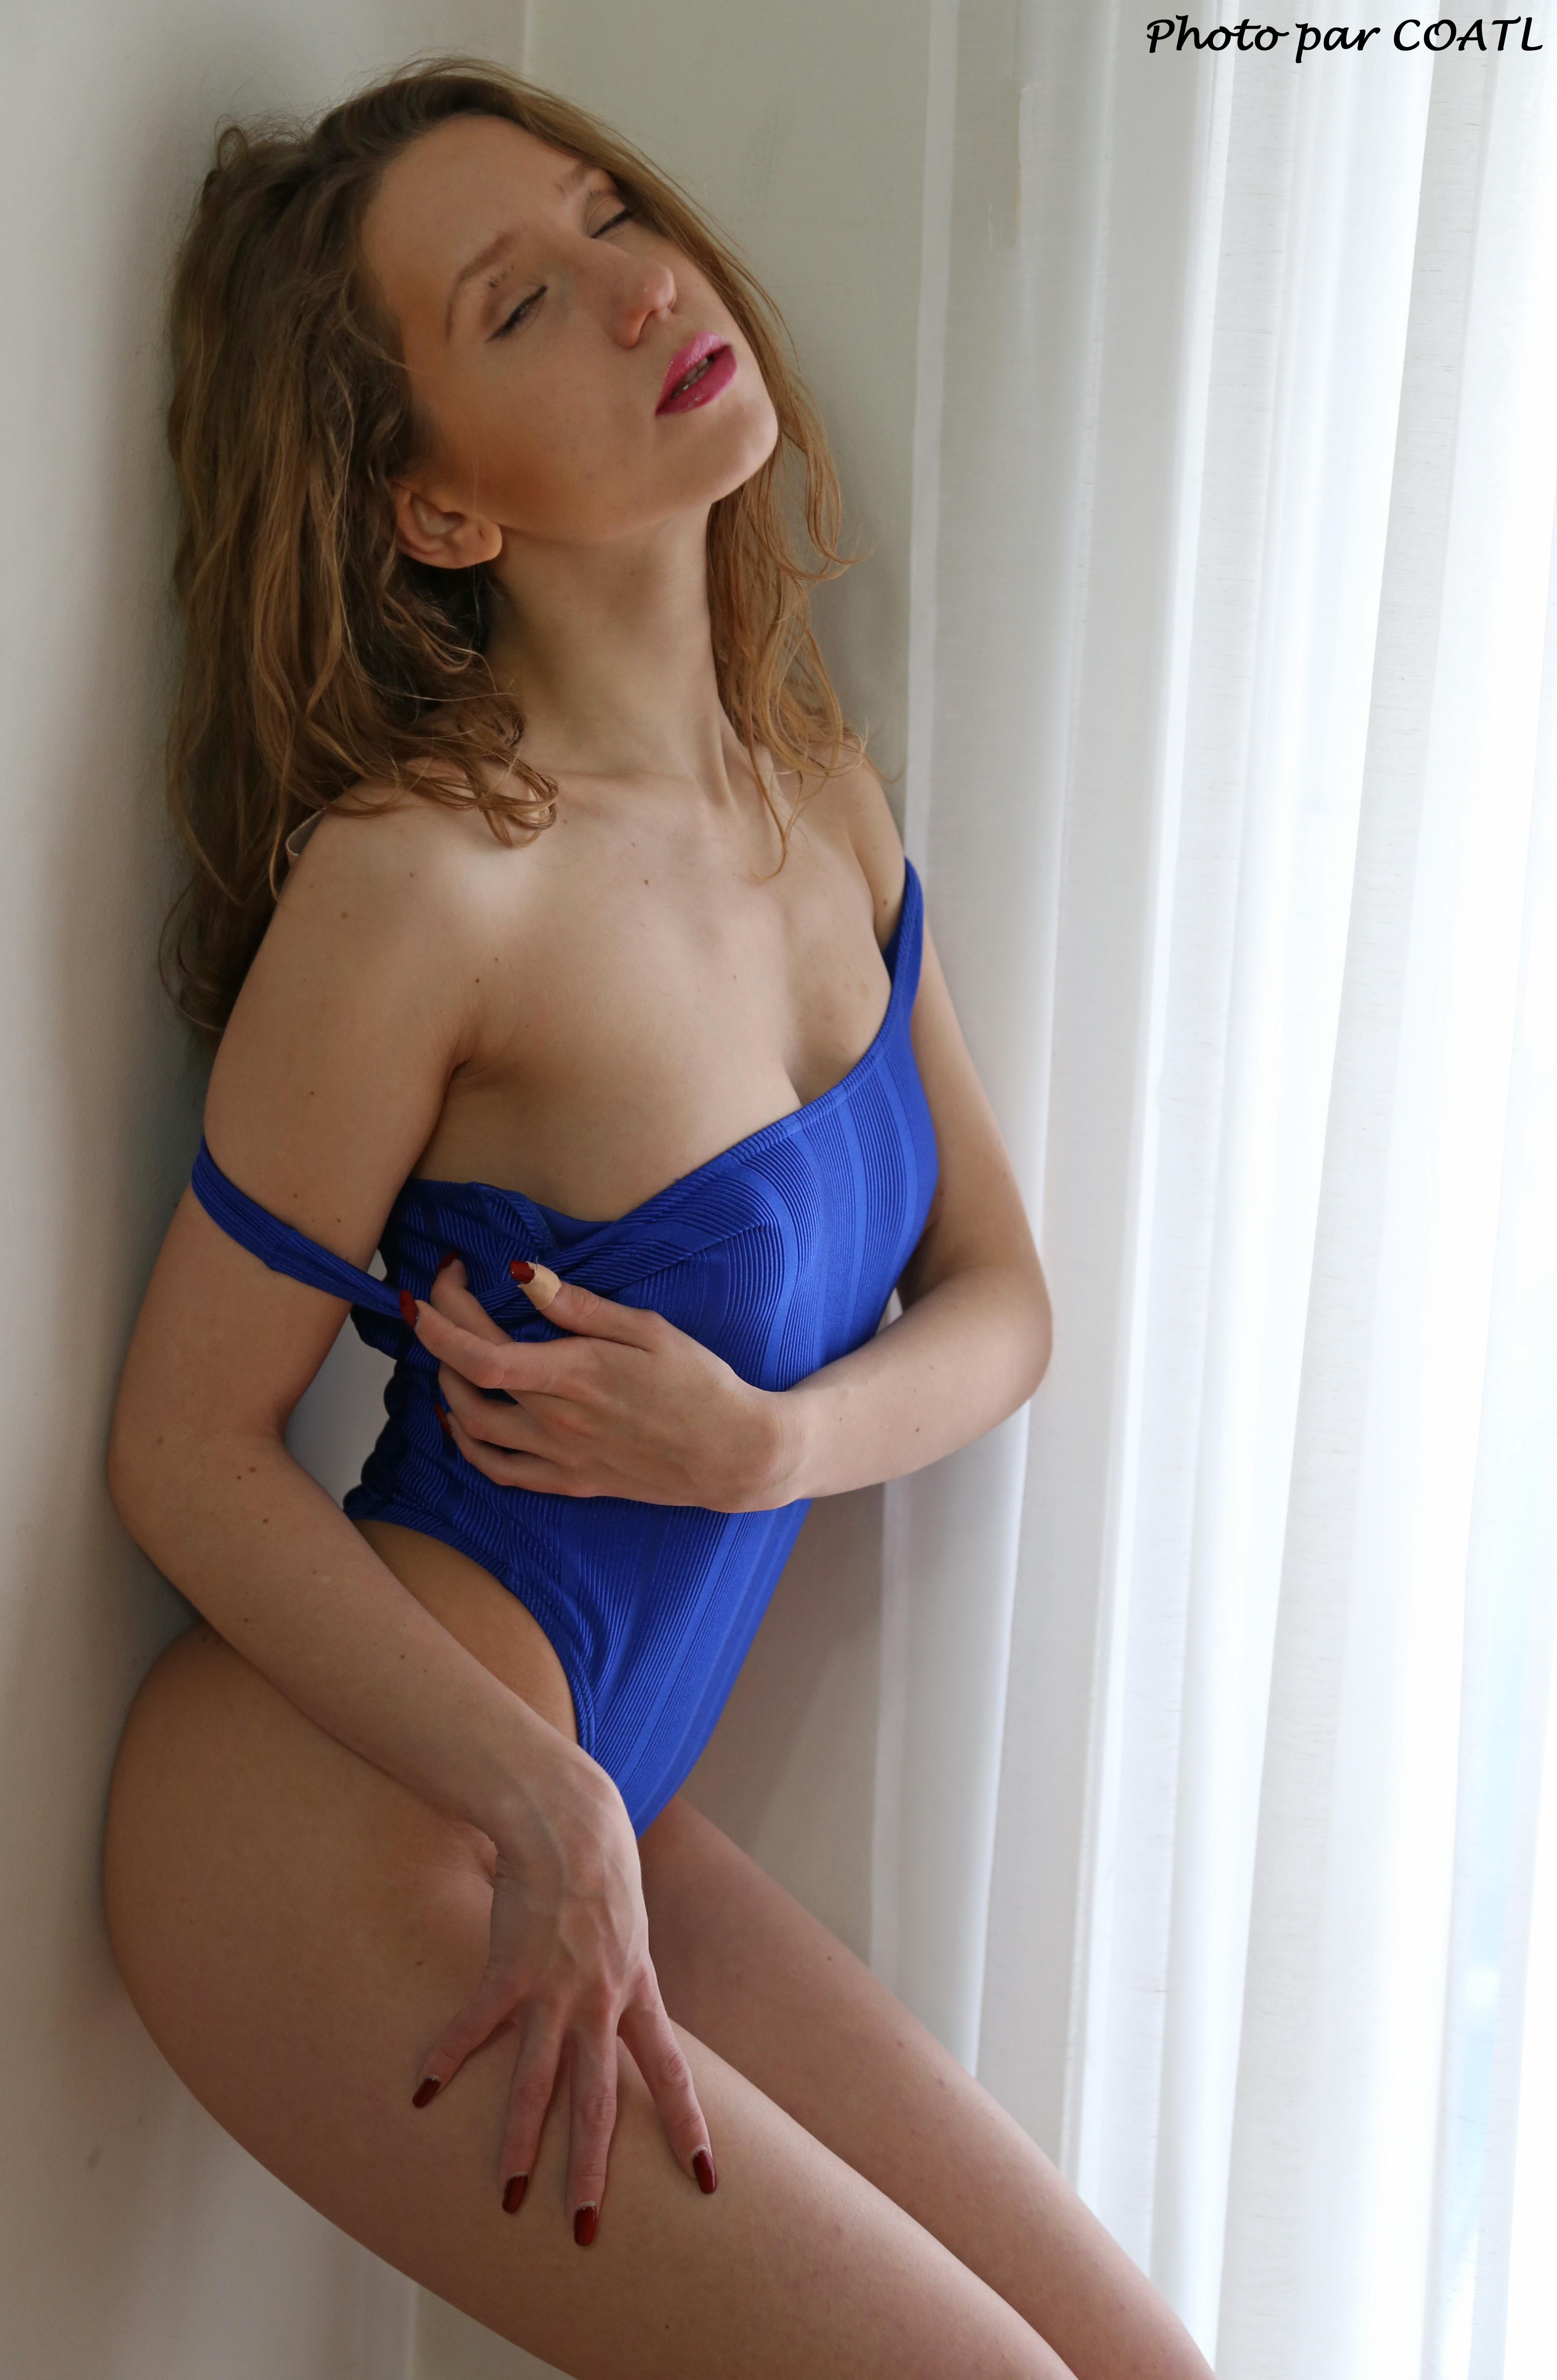 Naomie de bleu dévêtue 6